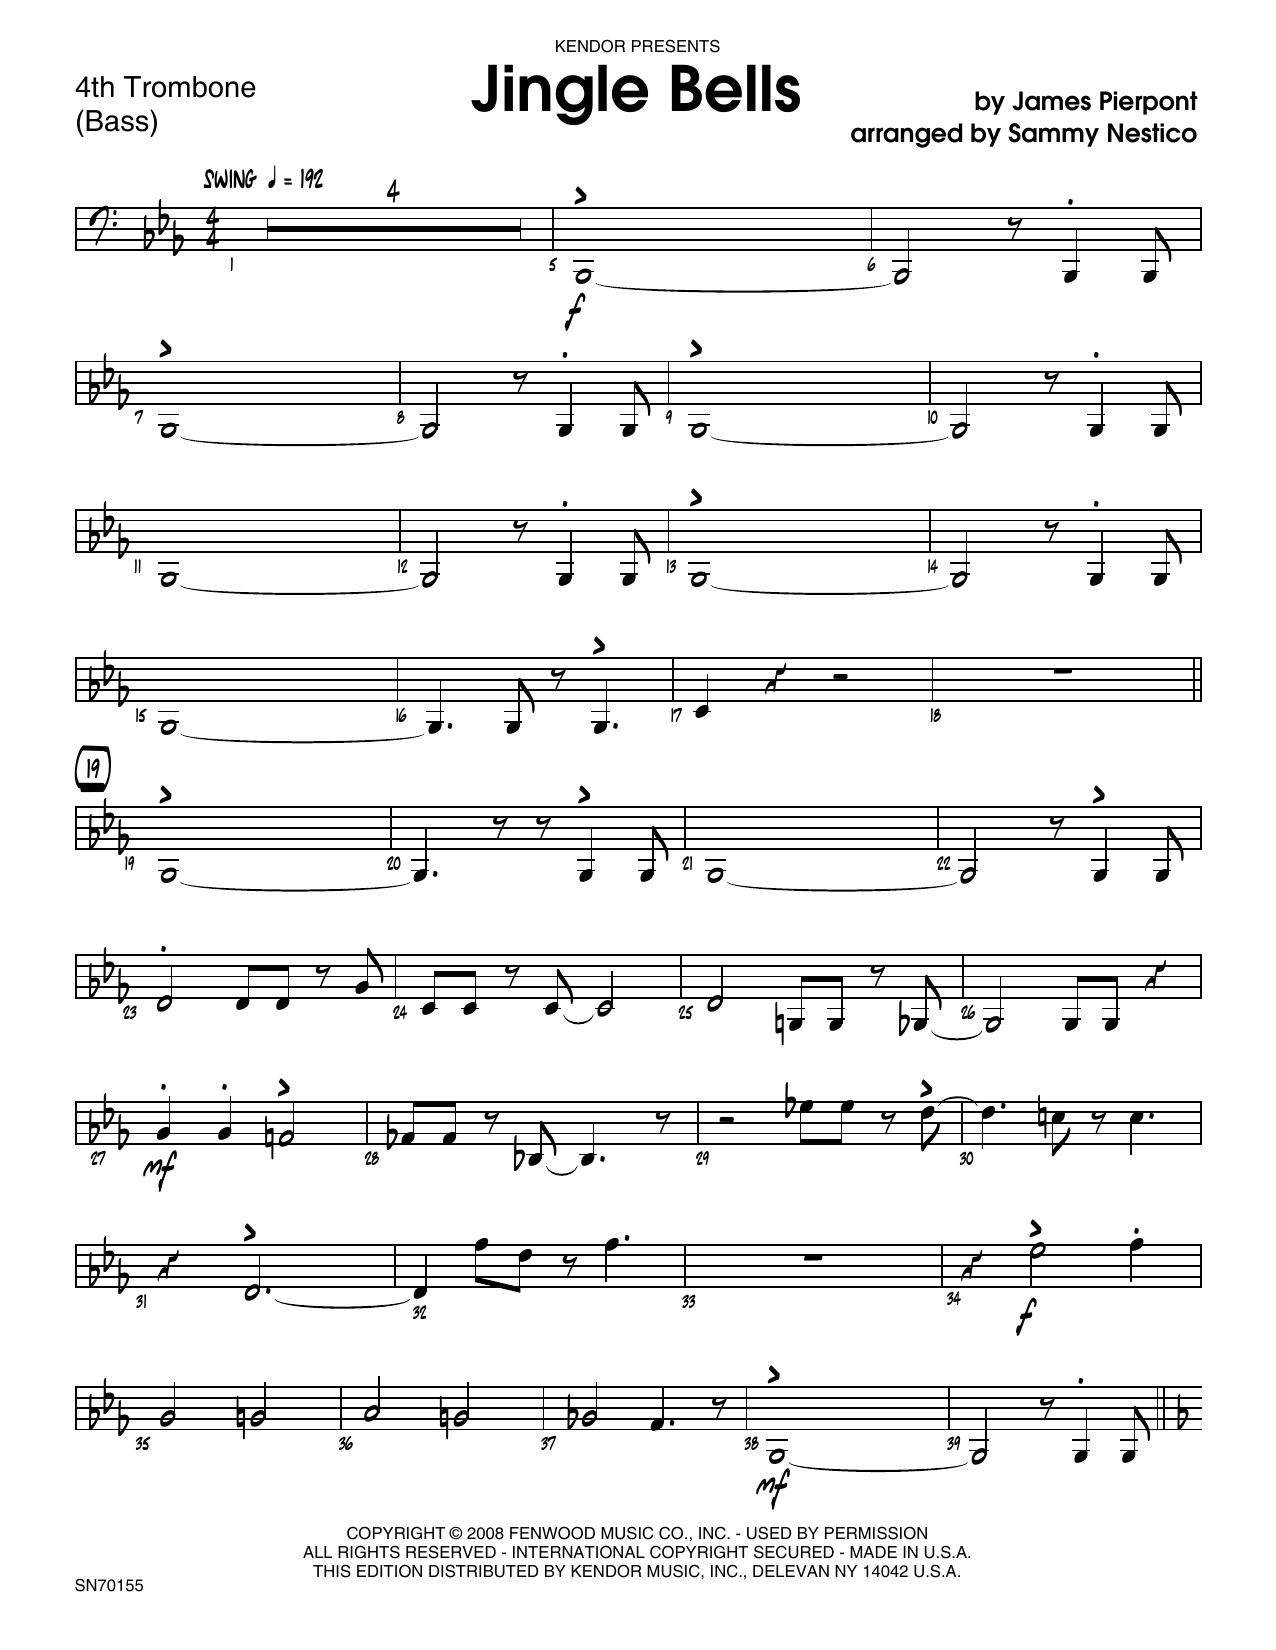 Jingle Bells - 4th Trombone Sheet Music